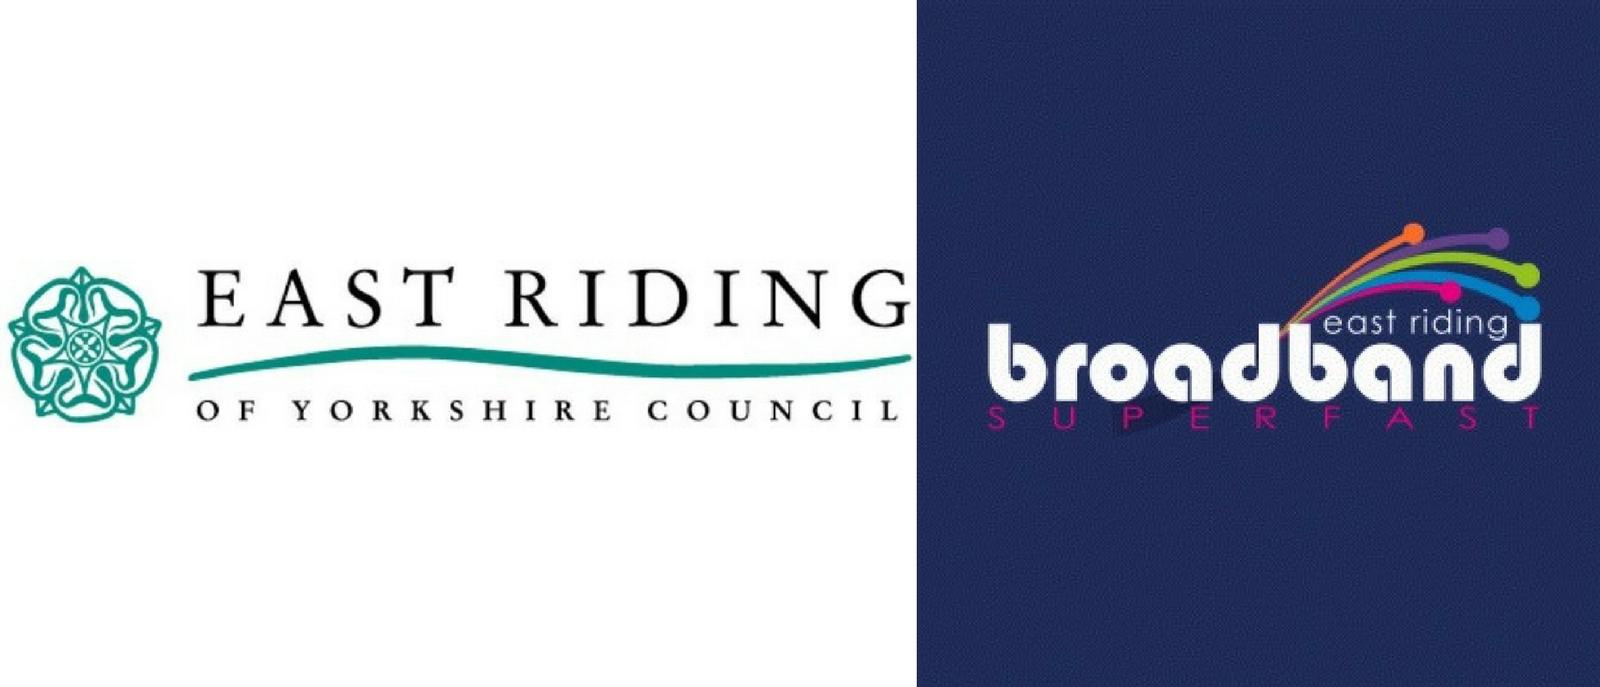 Pick-and-Mix-Marketing-Broadband-East-Riding